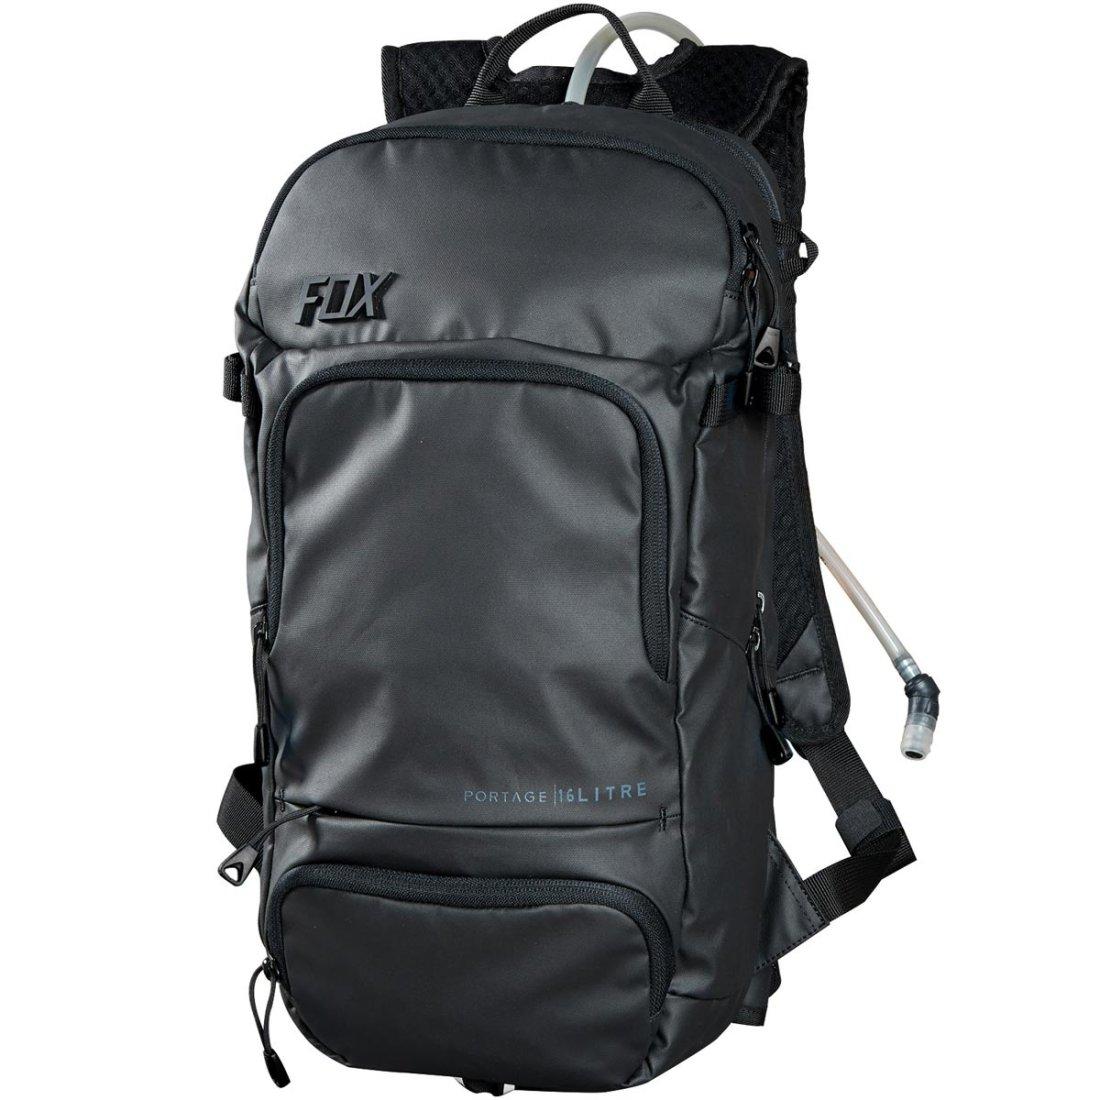 FOX Portage Hydration Pack Black b2f1e71e1851